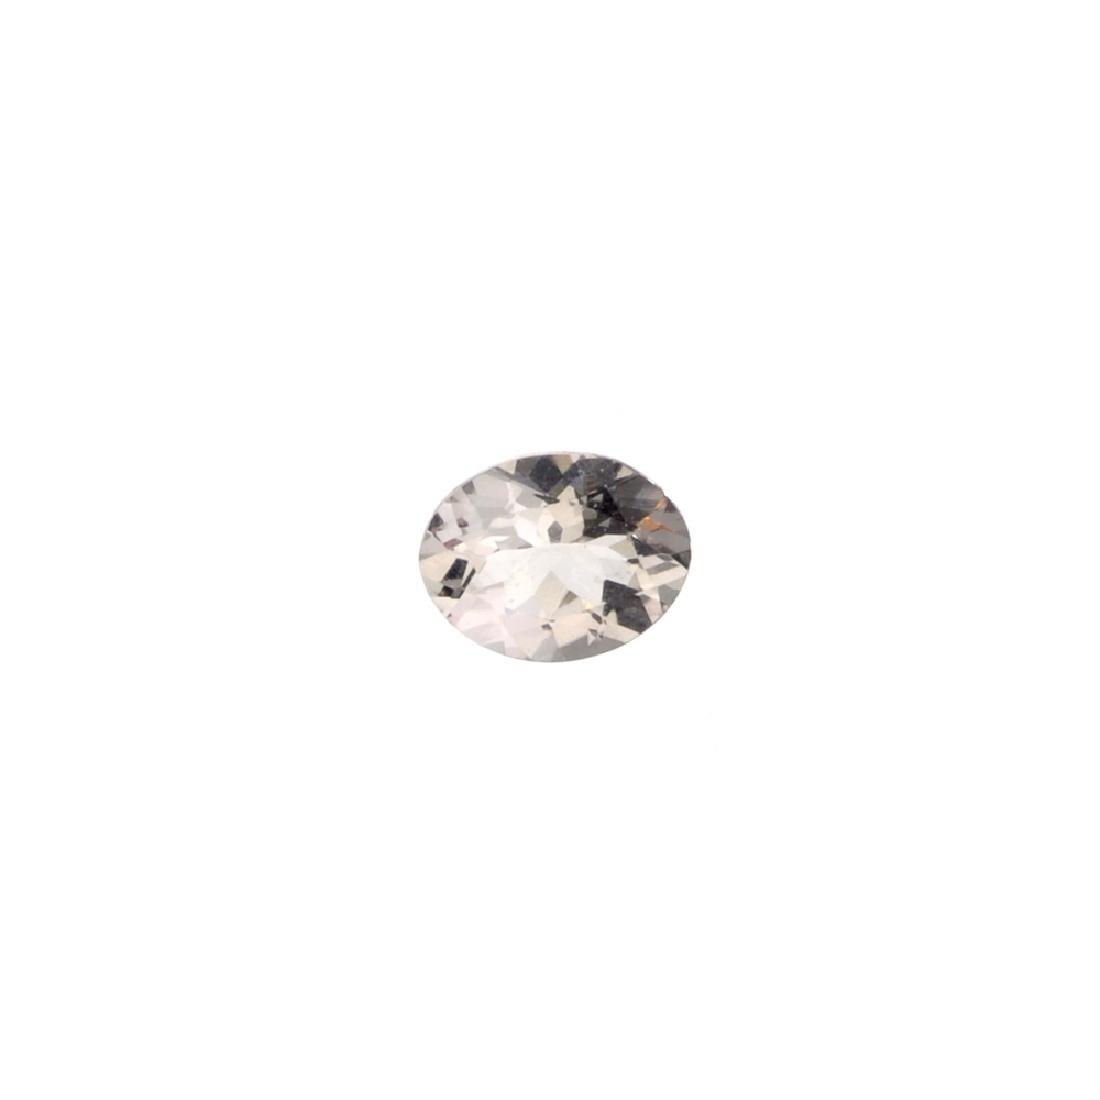 APP: 1k 1.44CT Oval Cut Morganite Gemstone